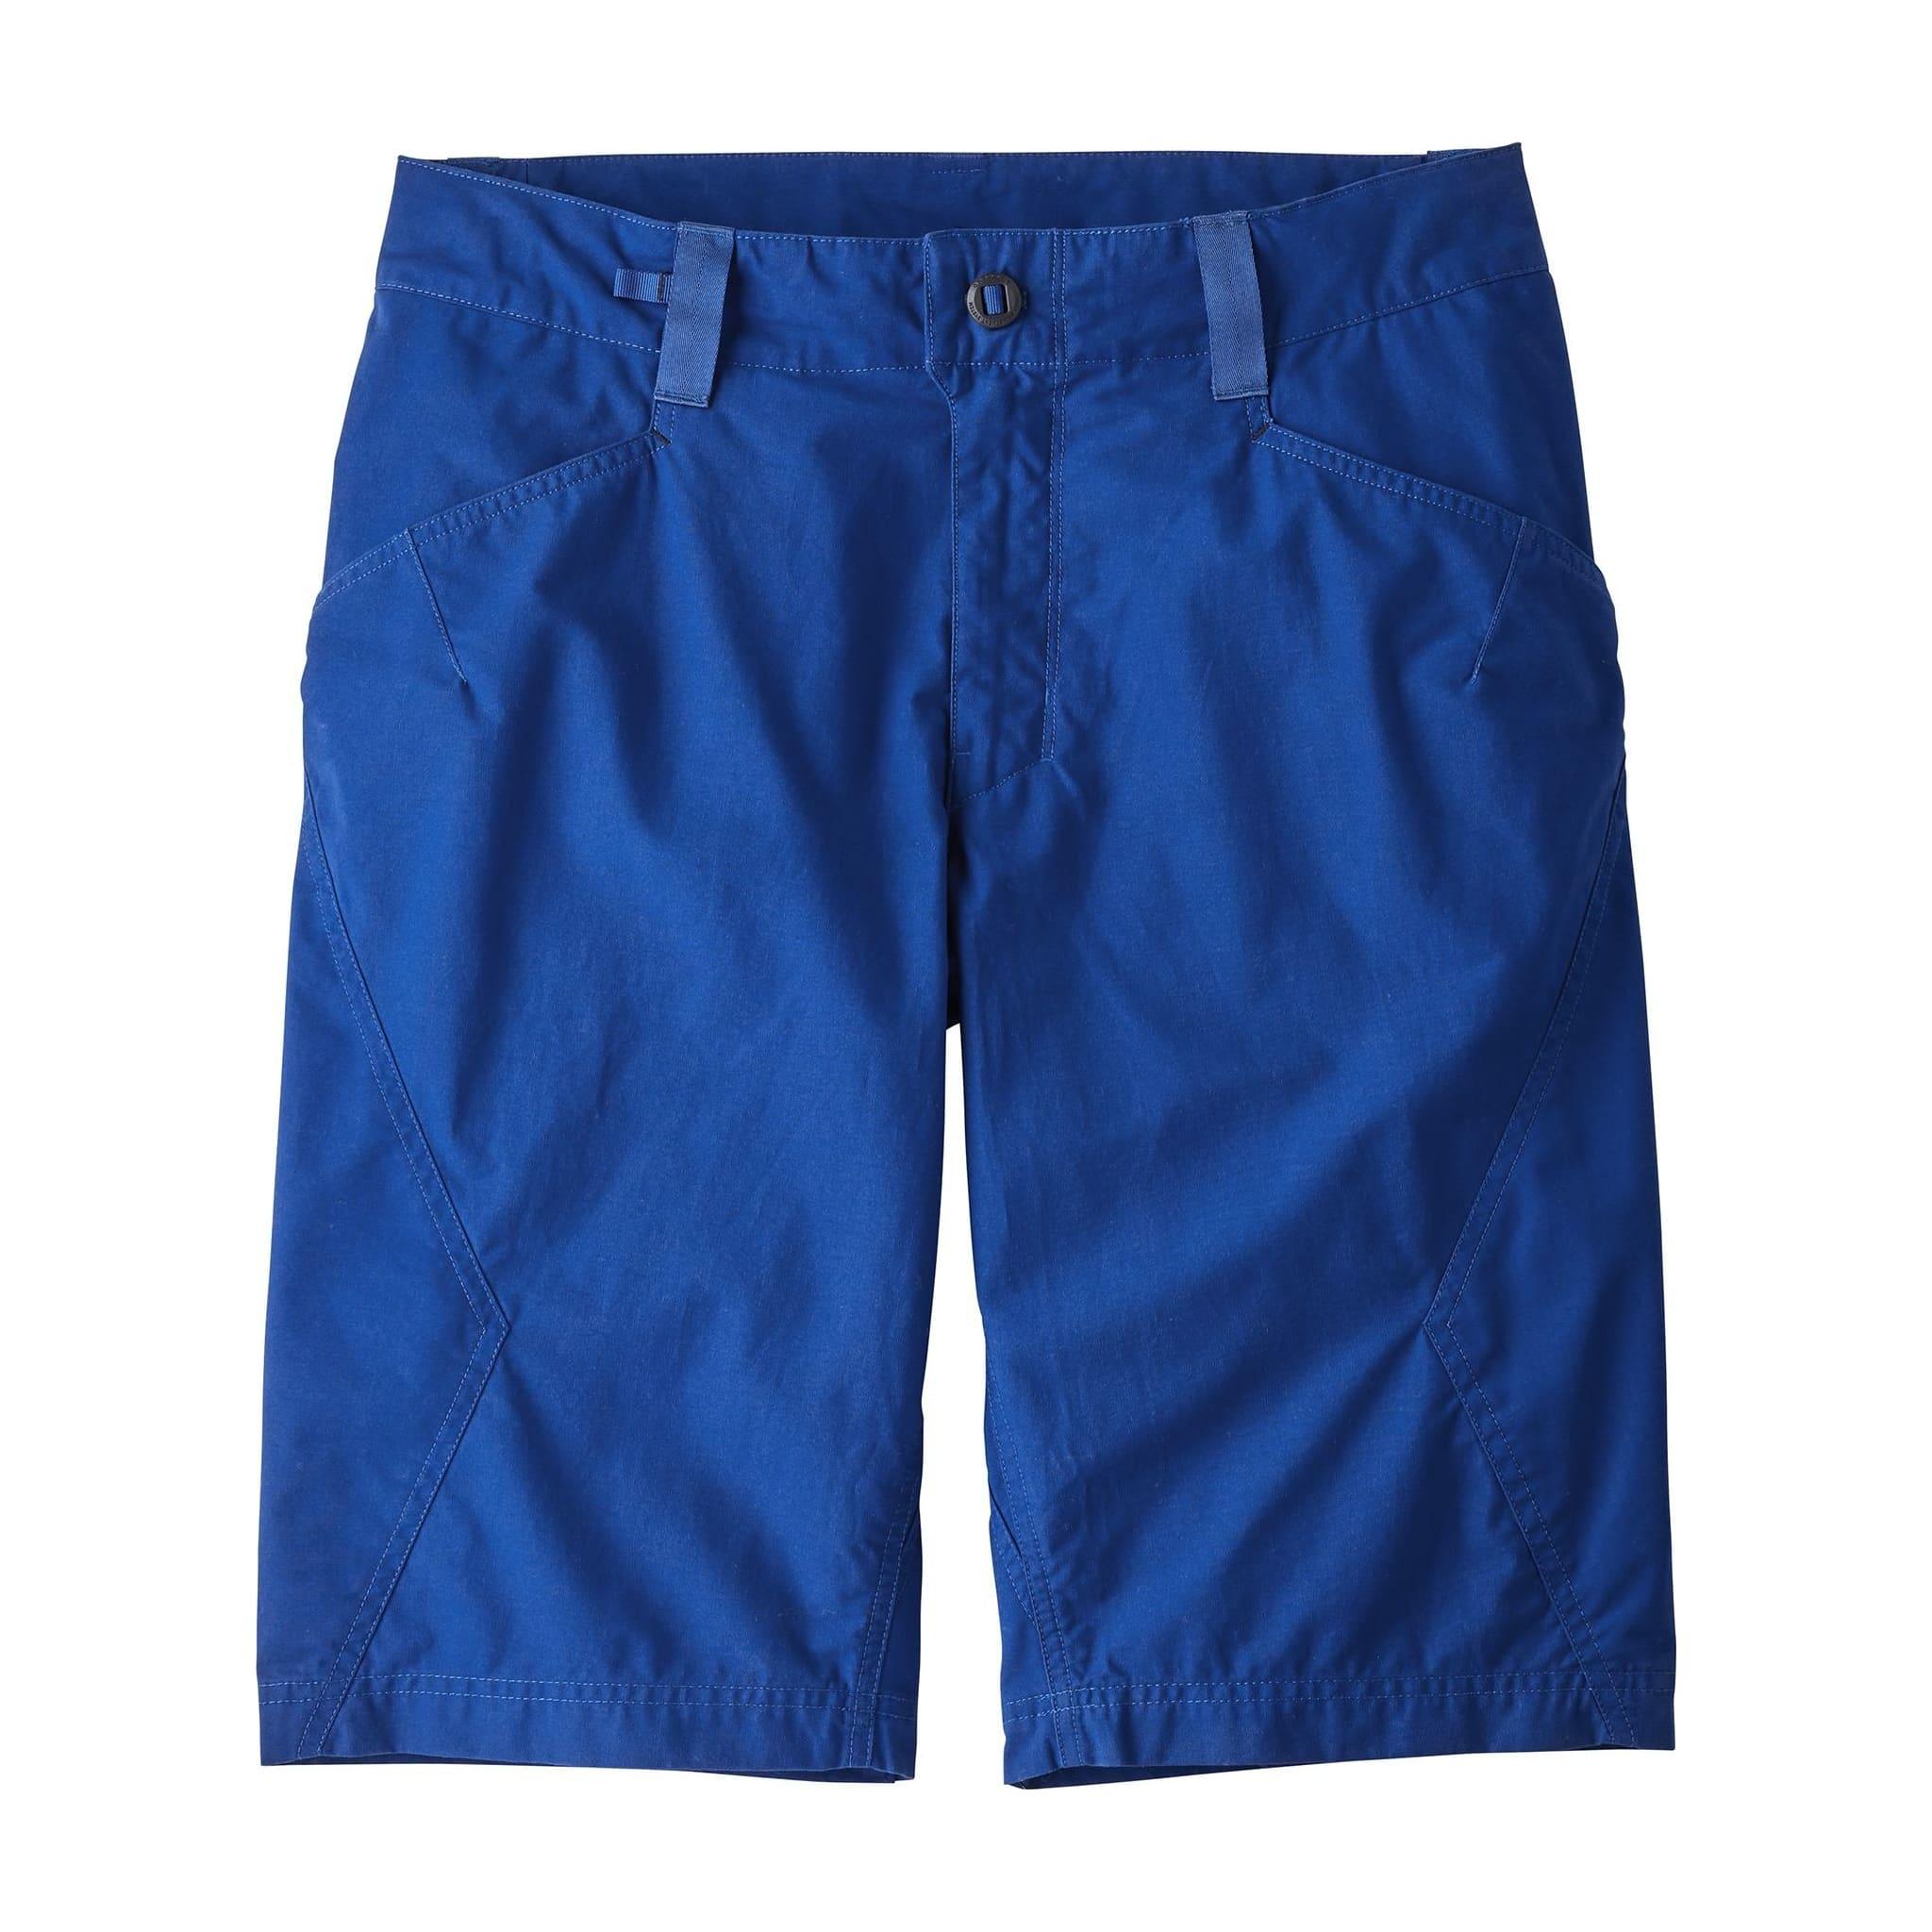 Digg shorts for klatring og hverdags